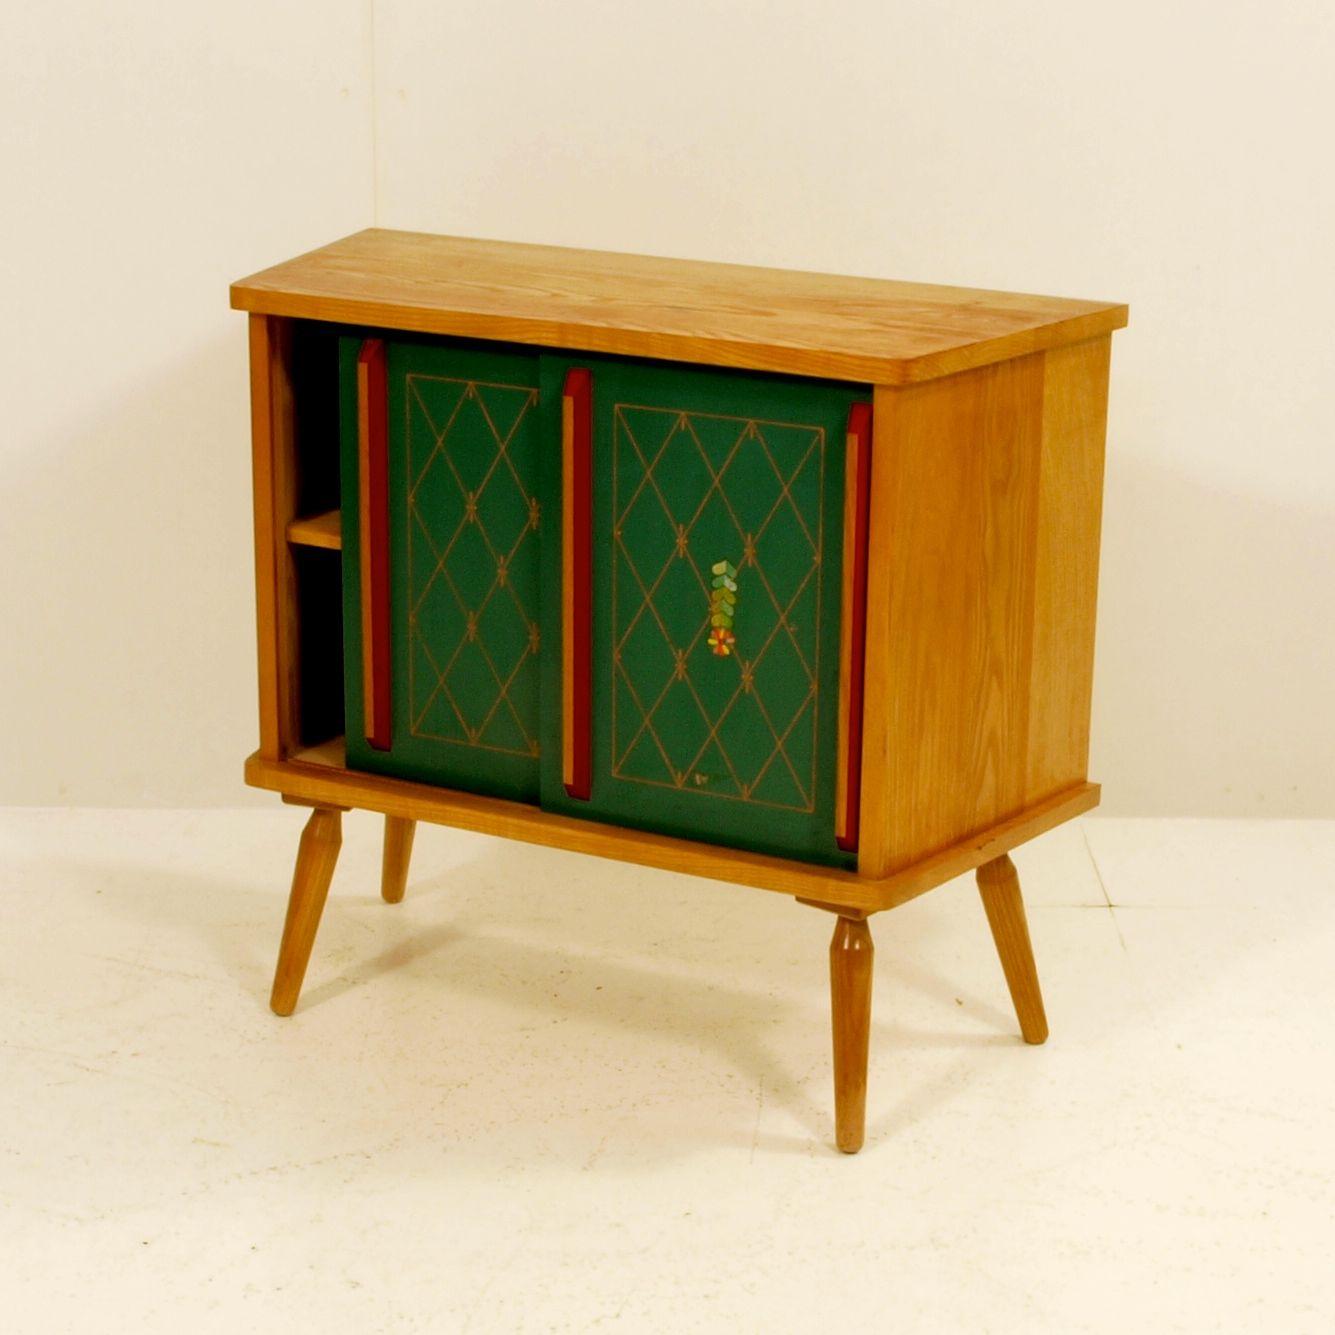 schiebeschrank schweizer heimatstil m bel z rich vintagem bel. Black Bedroom Furniture Sets. Home Design Ideas